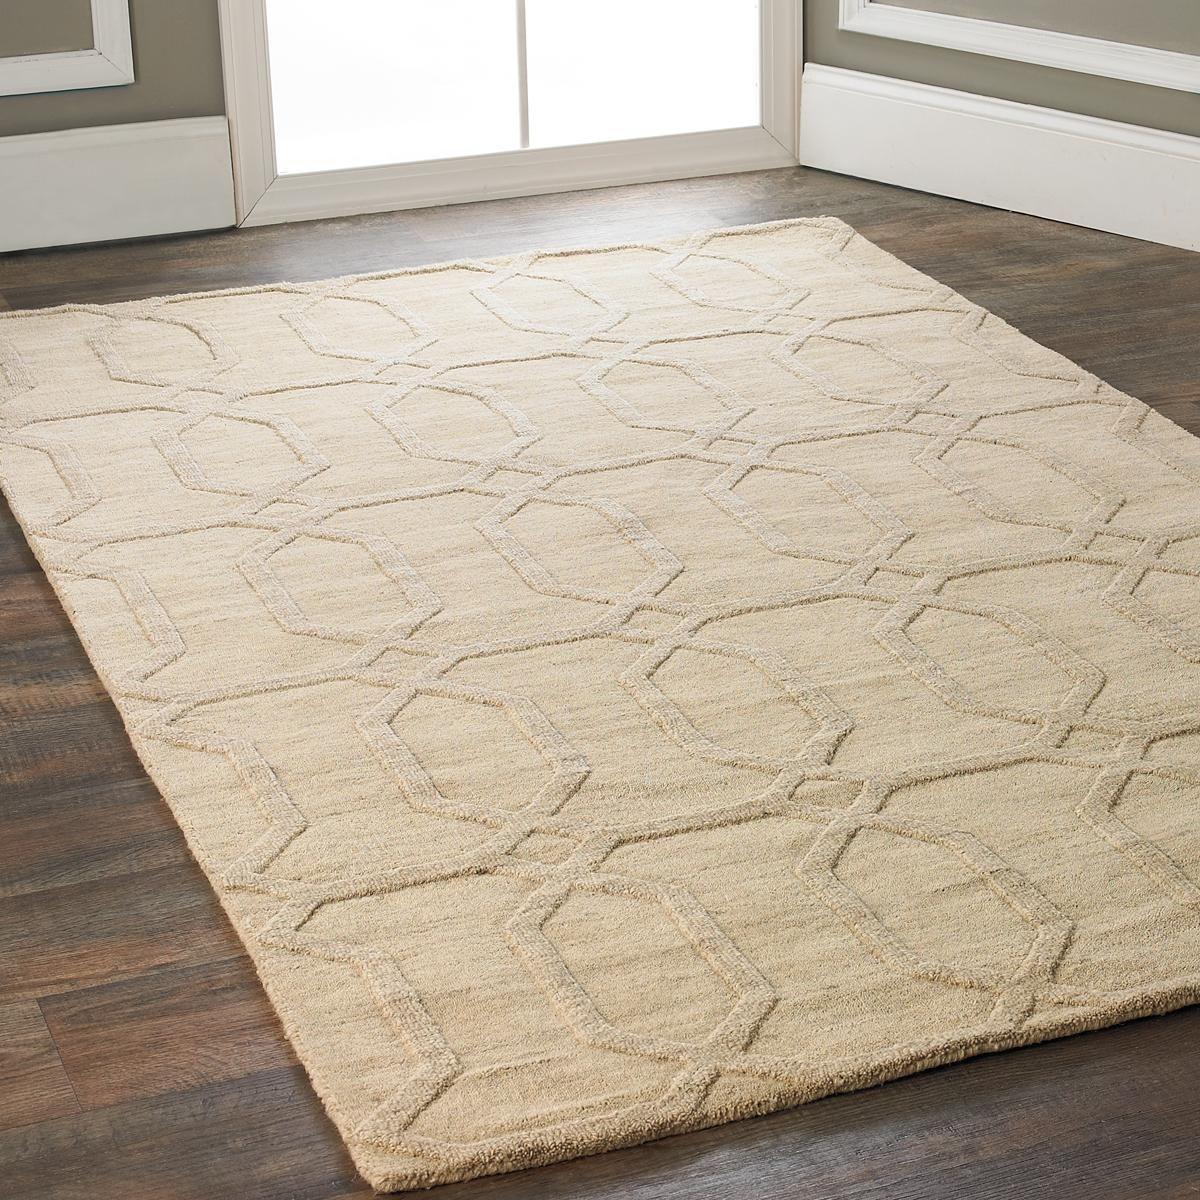 Diamond Prism Imprint Rug Rugs Solid Color Rug Diy Carpet